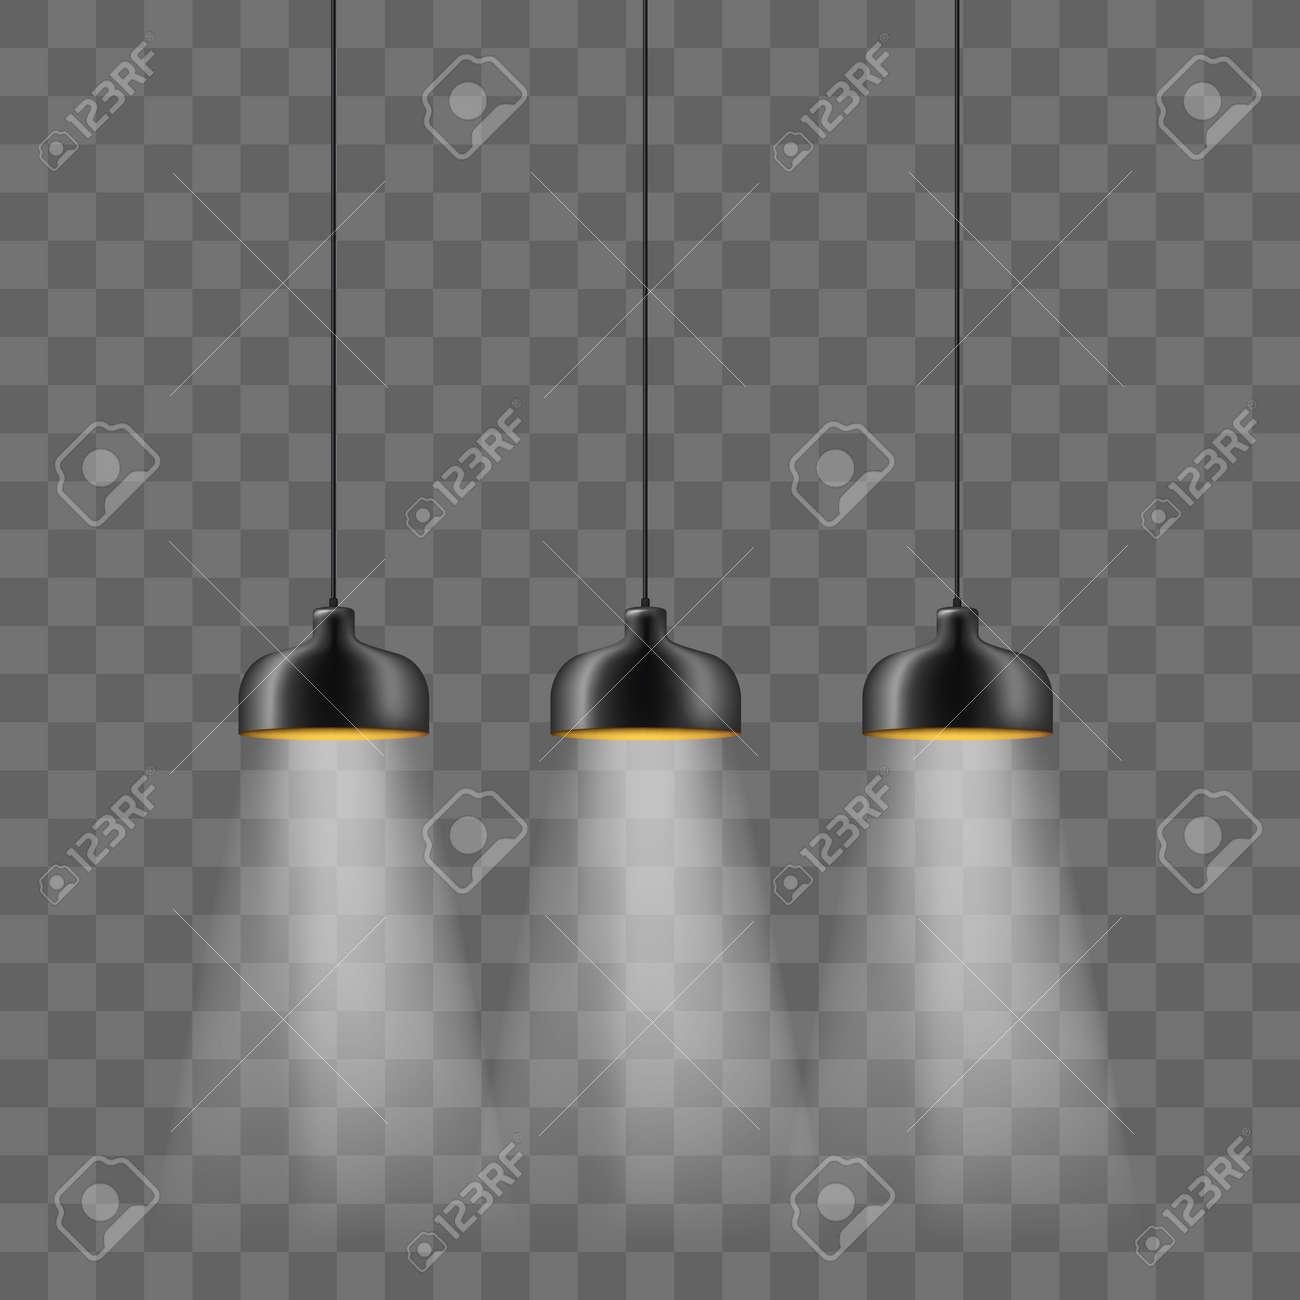 Modern black metallic lamp-shade electric illumination set. Loft ceiling lights isolated on the transparent background. Minimalistic interior design - 111840026